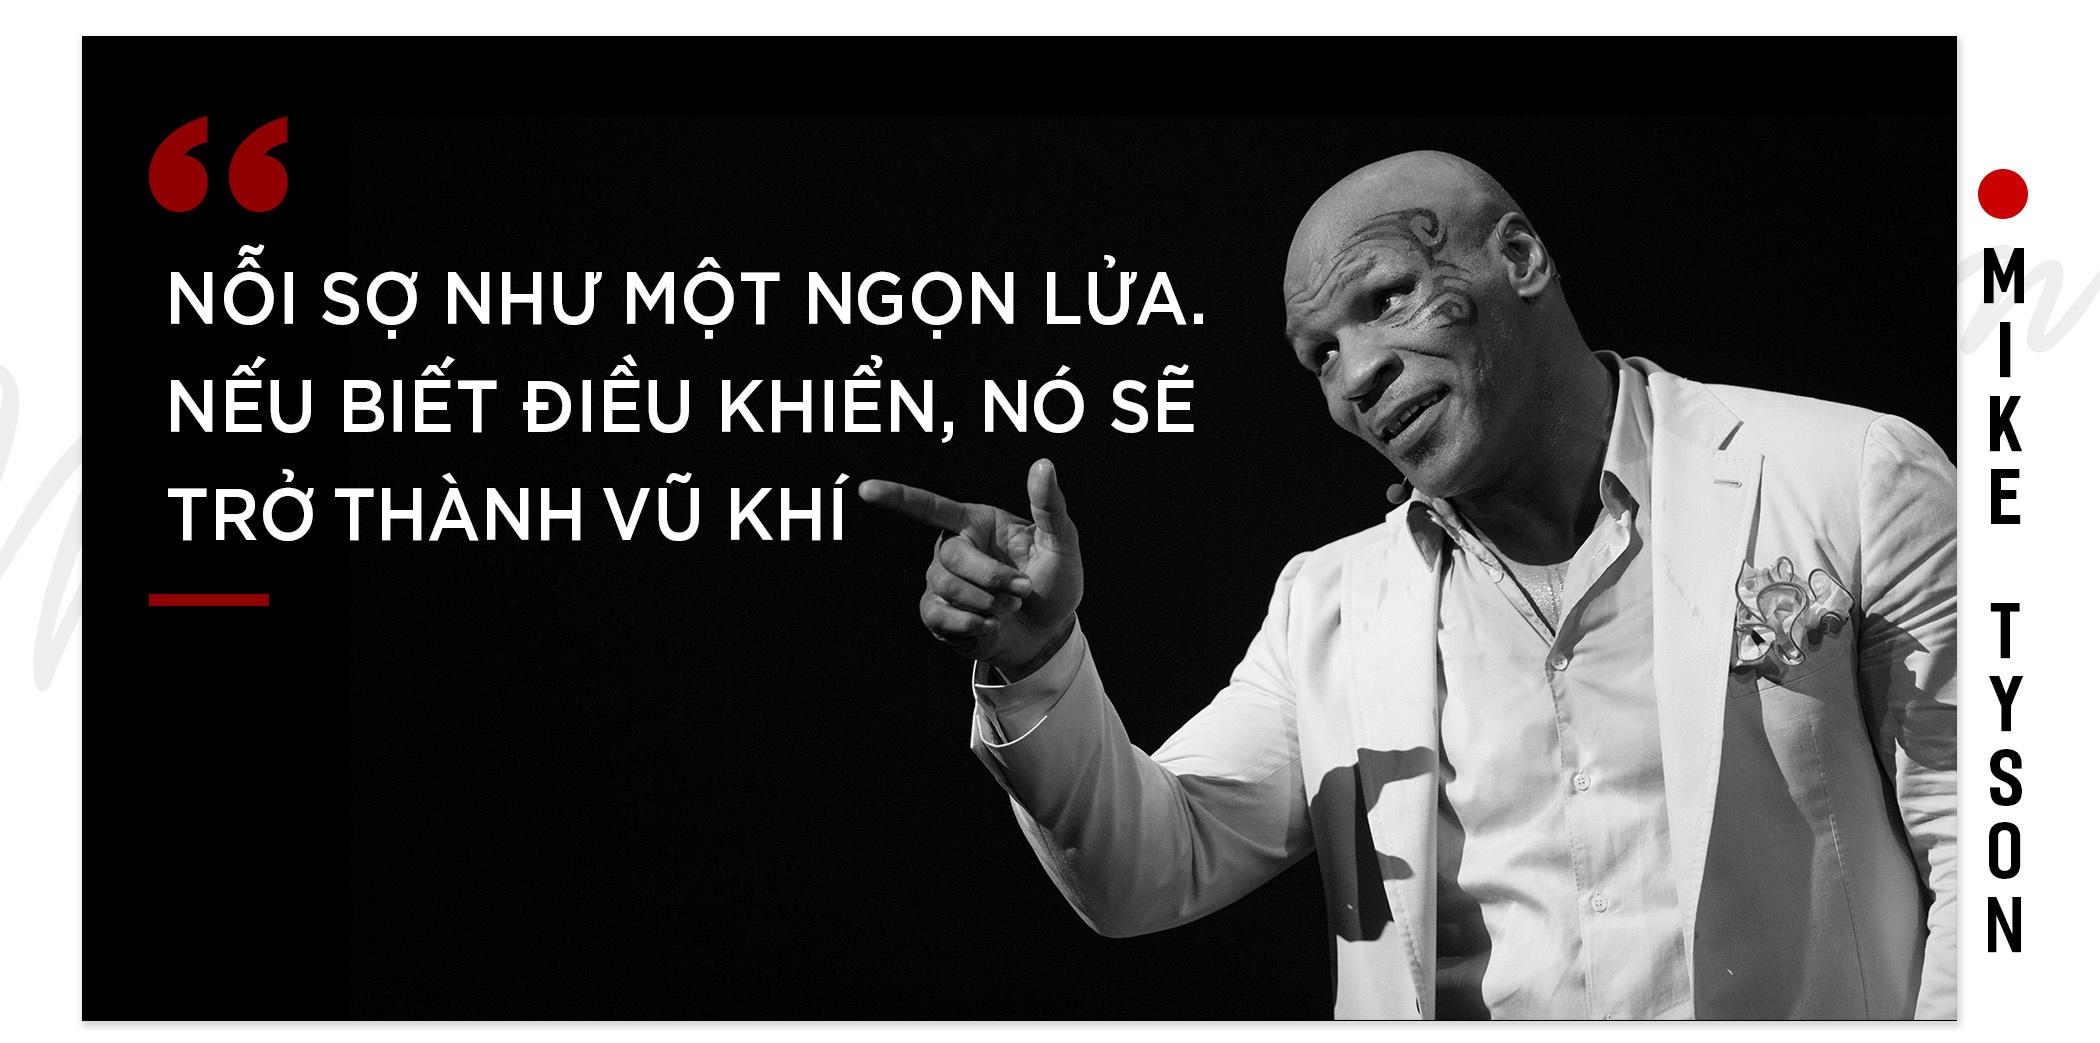 Mike Tyson - Su that tran trui: Quyen Anh, ma tuy, gai va su huy hoai hinh anh 7